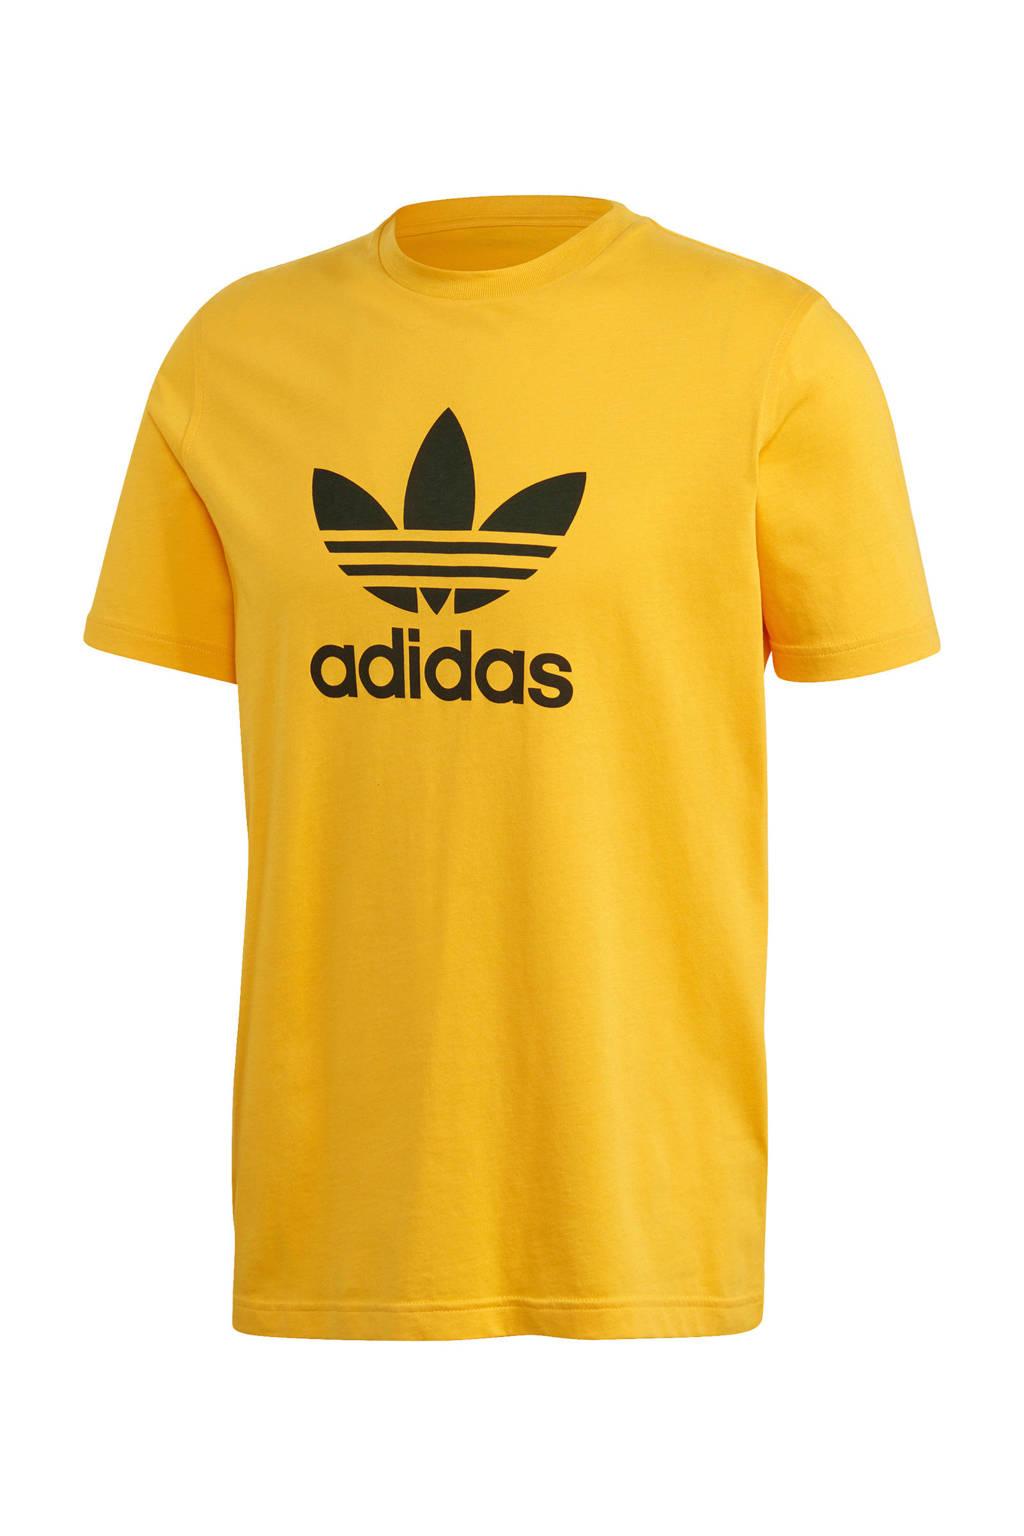 adidas Originals Adicolor T-shirt geel, Geel